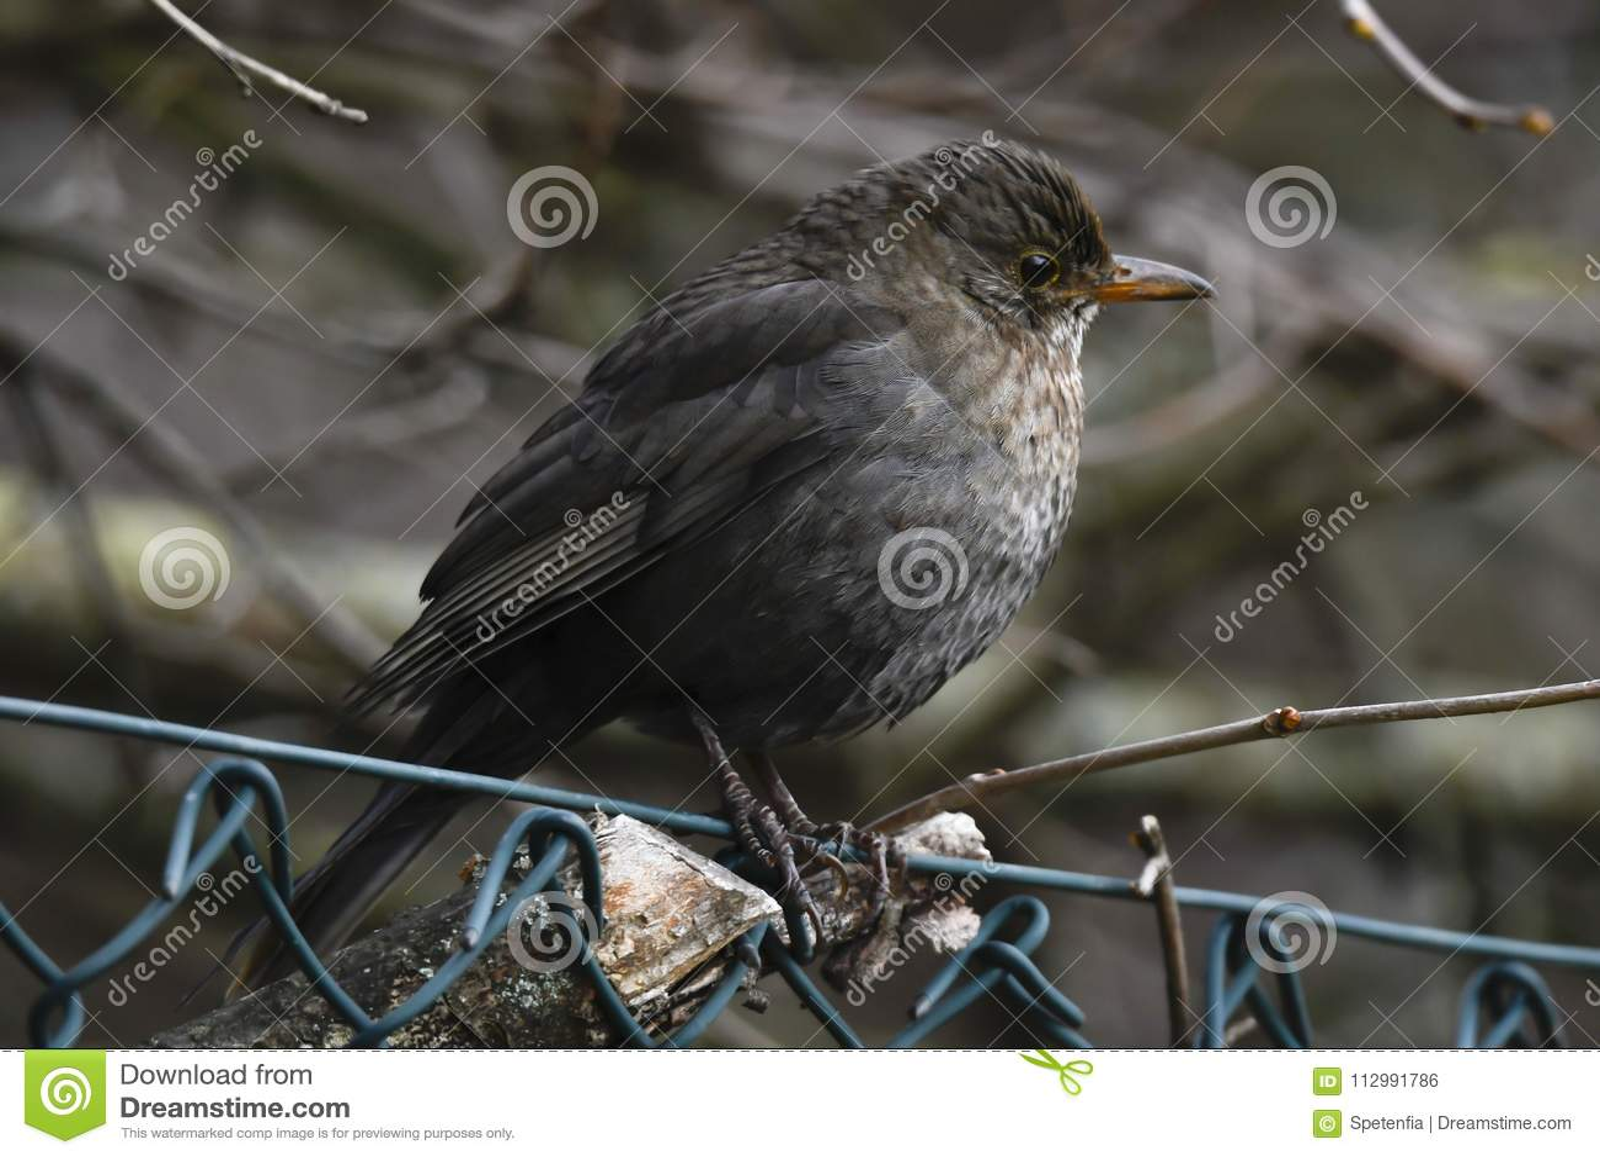 Turdus merula common blackbird female